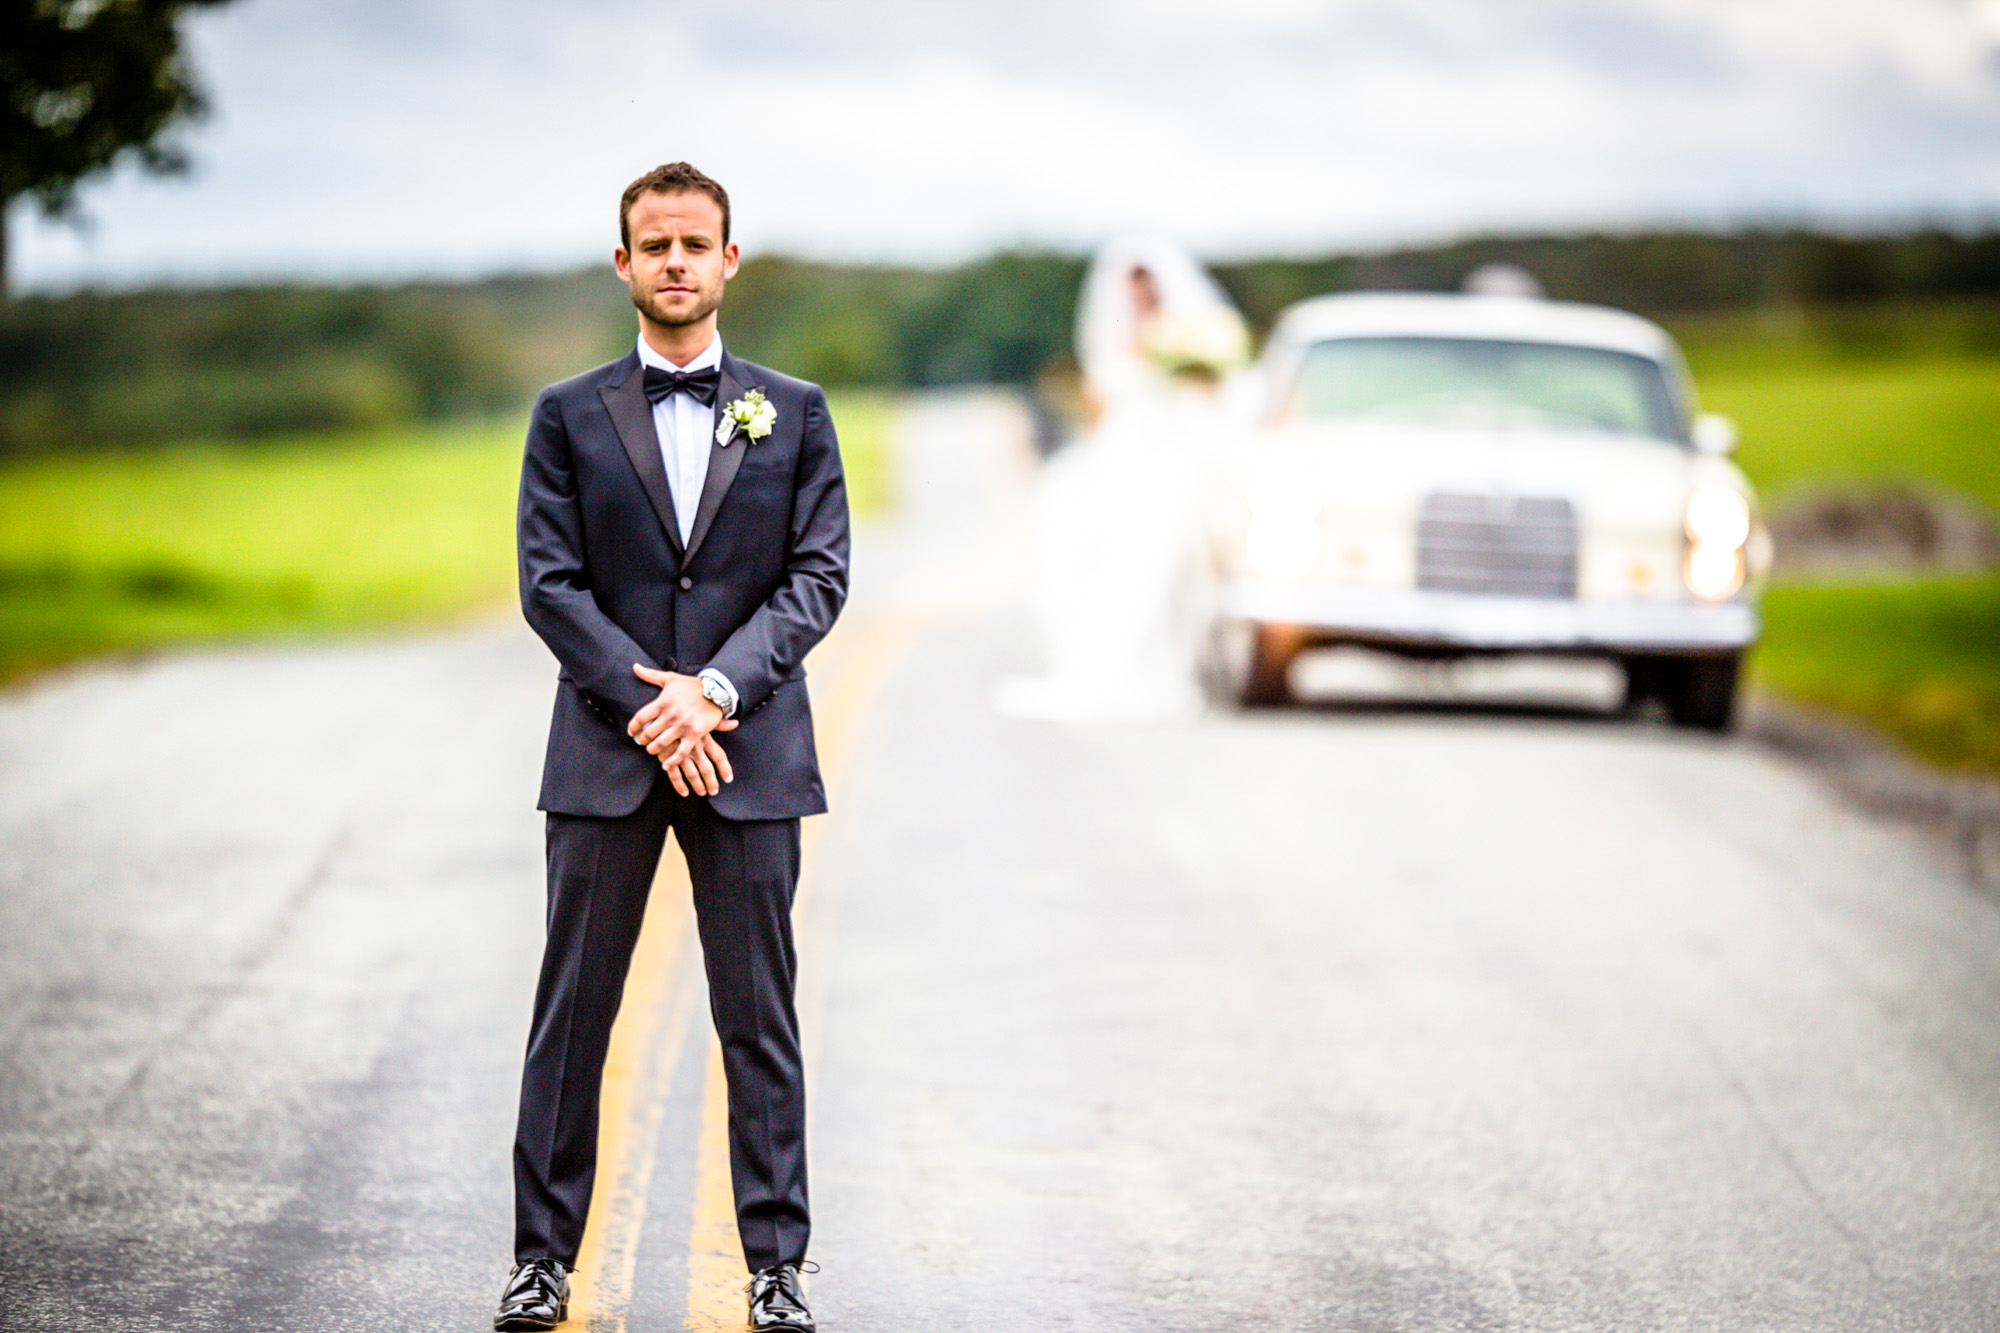 scranton_wedding_photographer_lettieri_pa (19 of 34).jpg